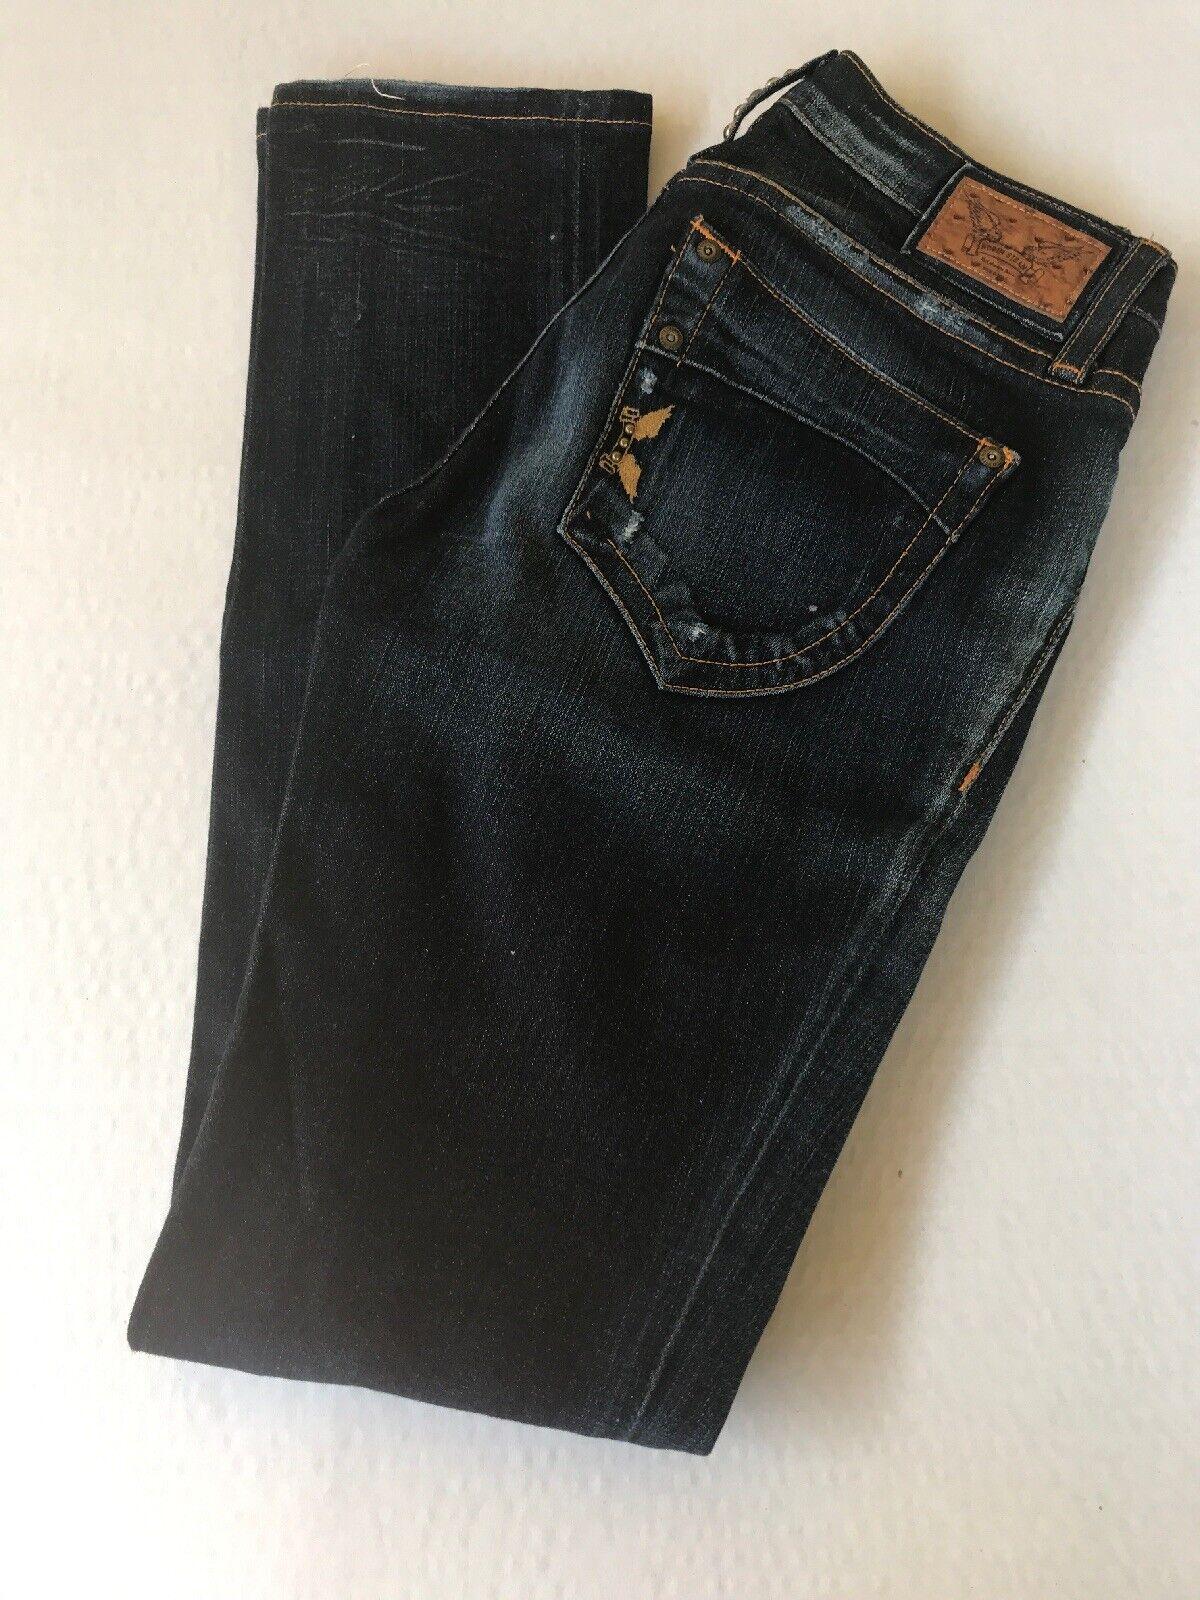 Robin Jeans Womens Skinny Dark Wash 27 NWOT Style SBT8360